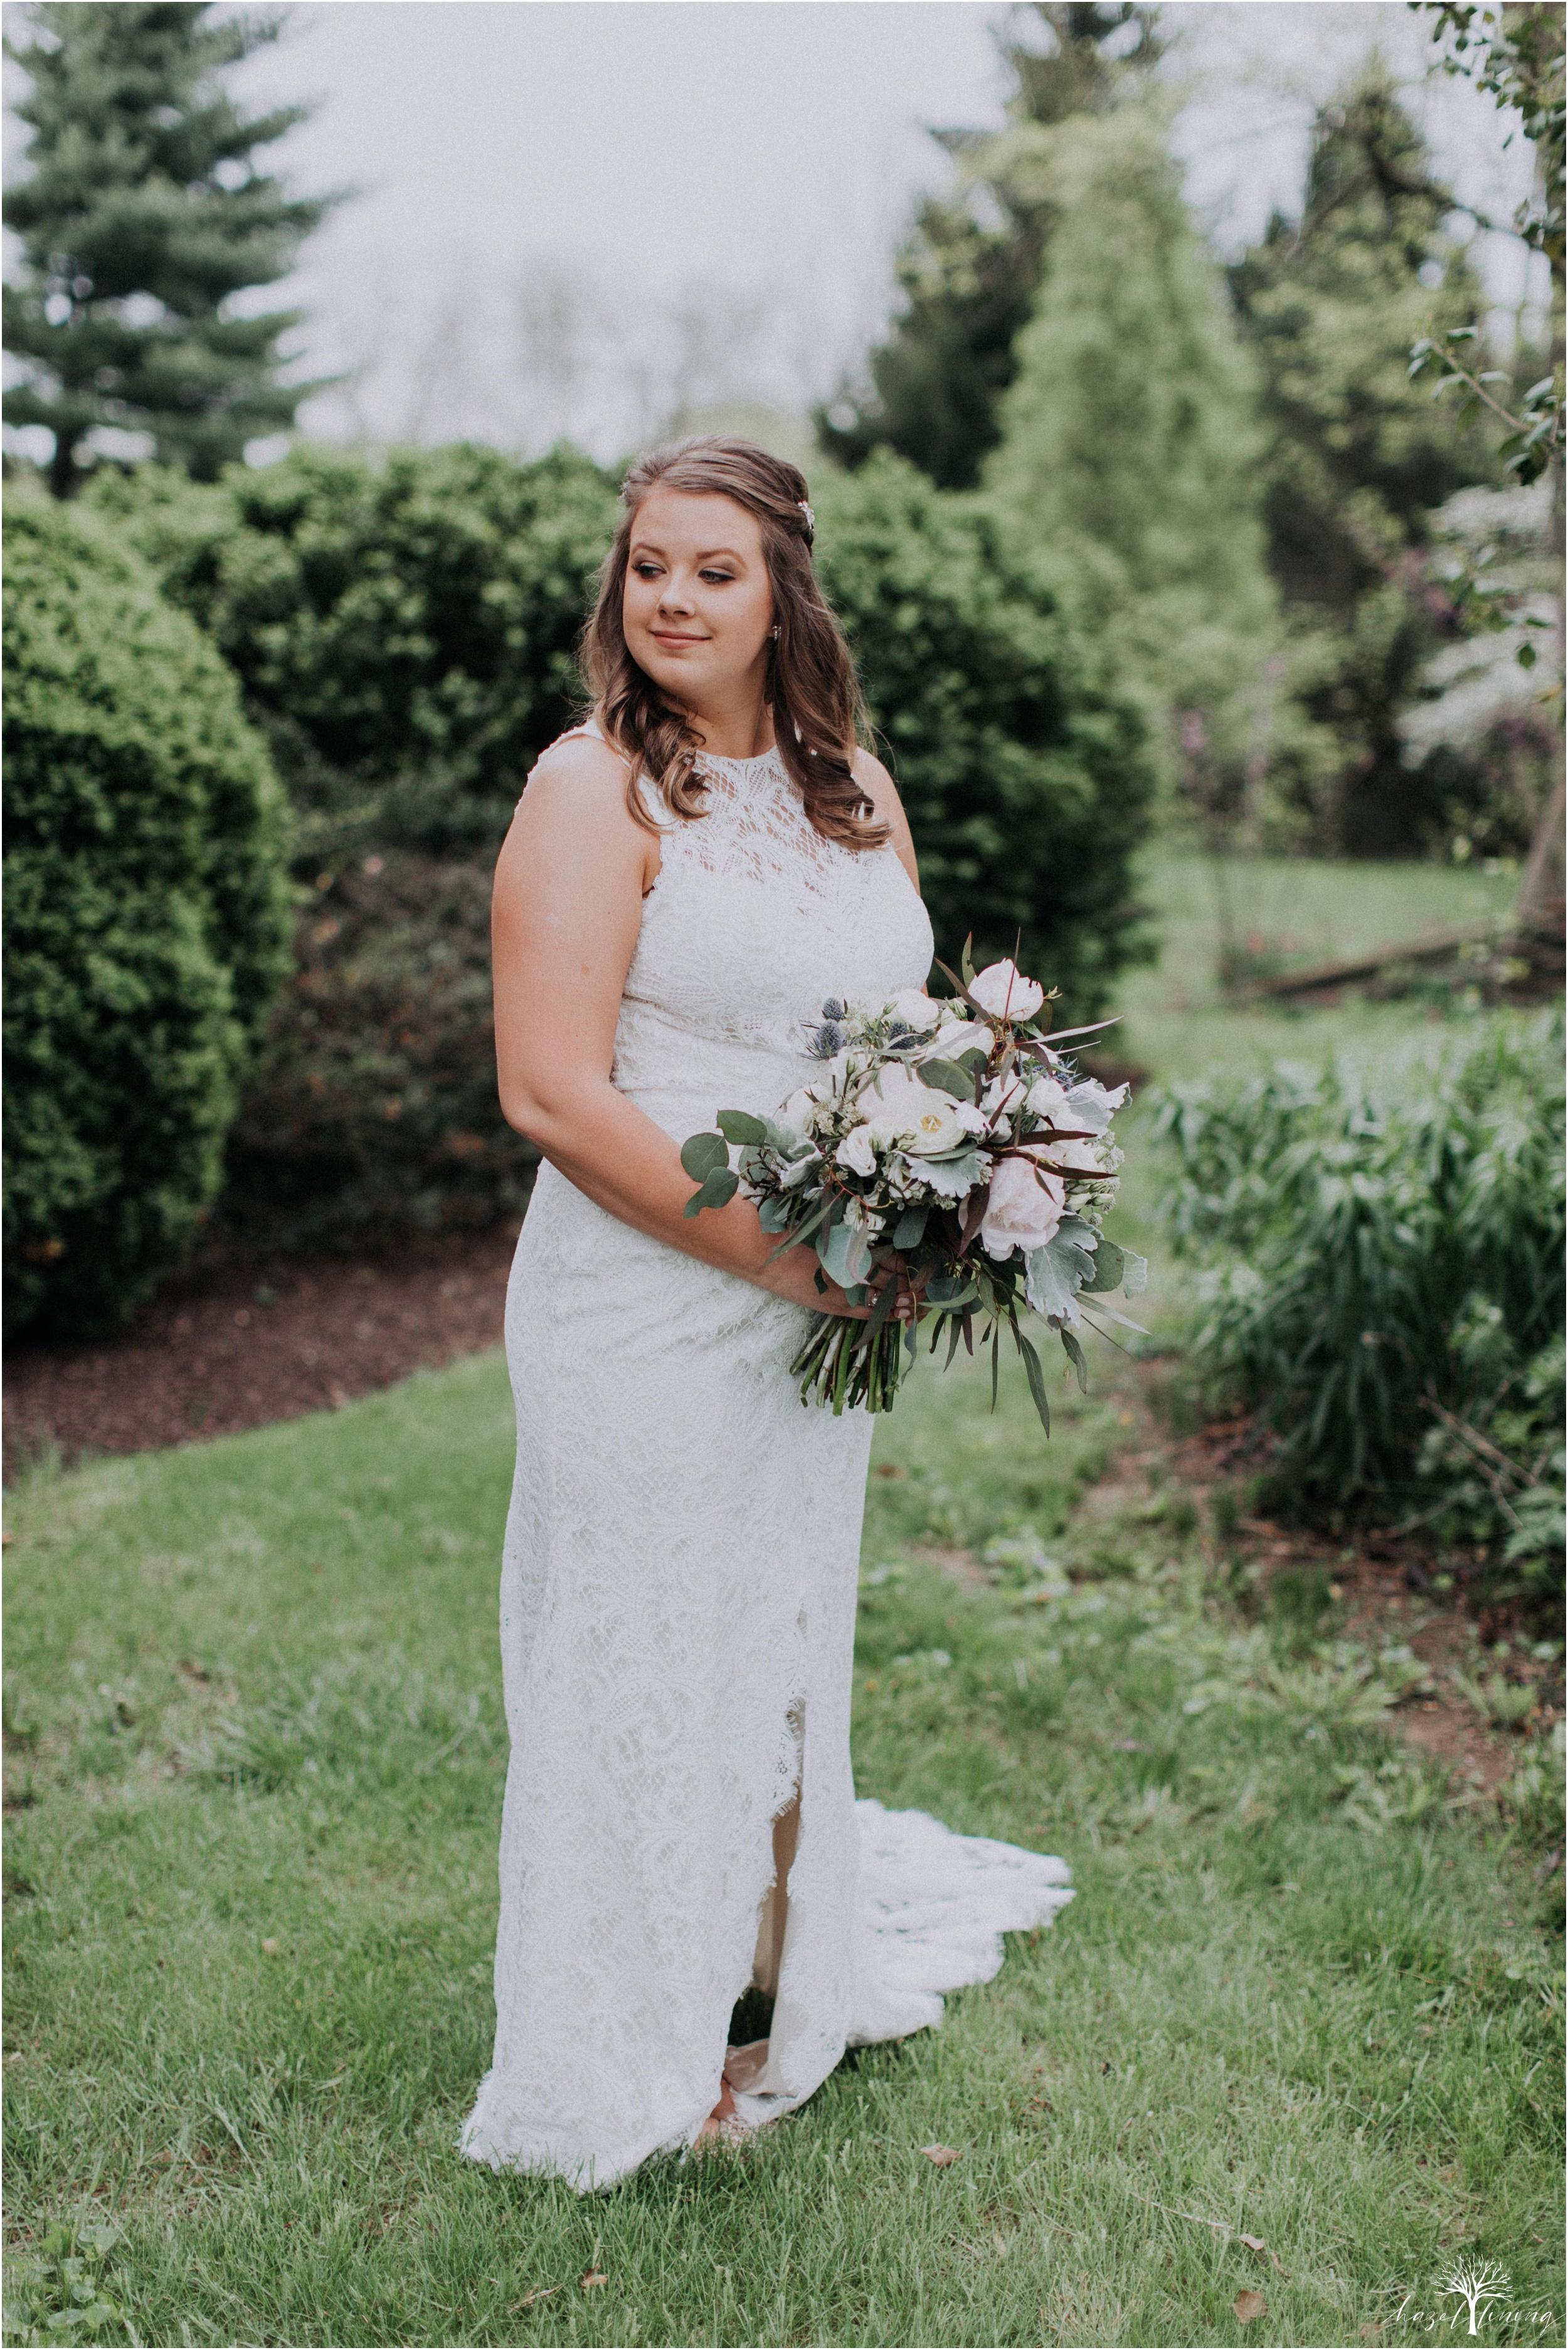 hazel-lining-travel-wedding-elopement-photography-abby-skyler-hunt-the-willis-house-york-pennsylvania-outdoor-estate-wedding_0014.jpg